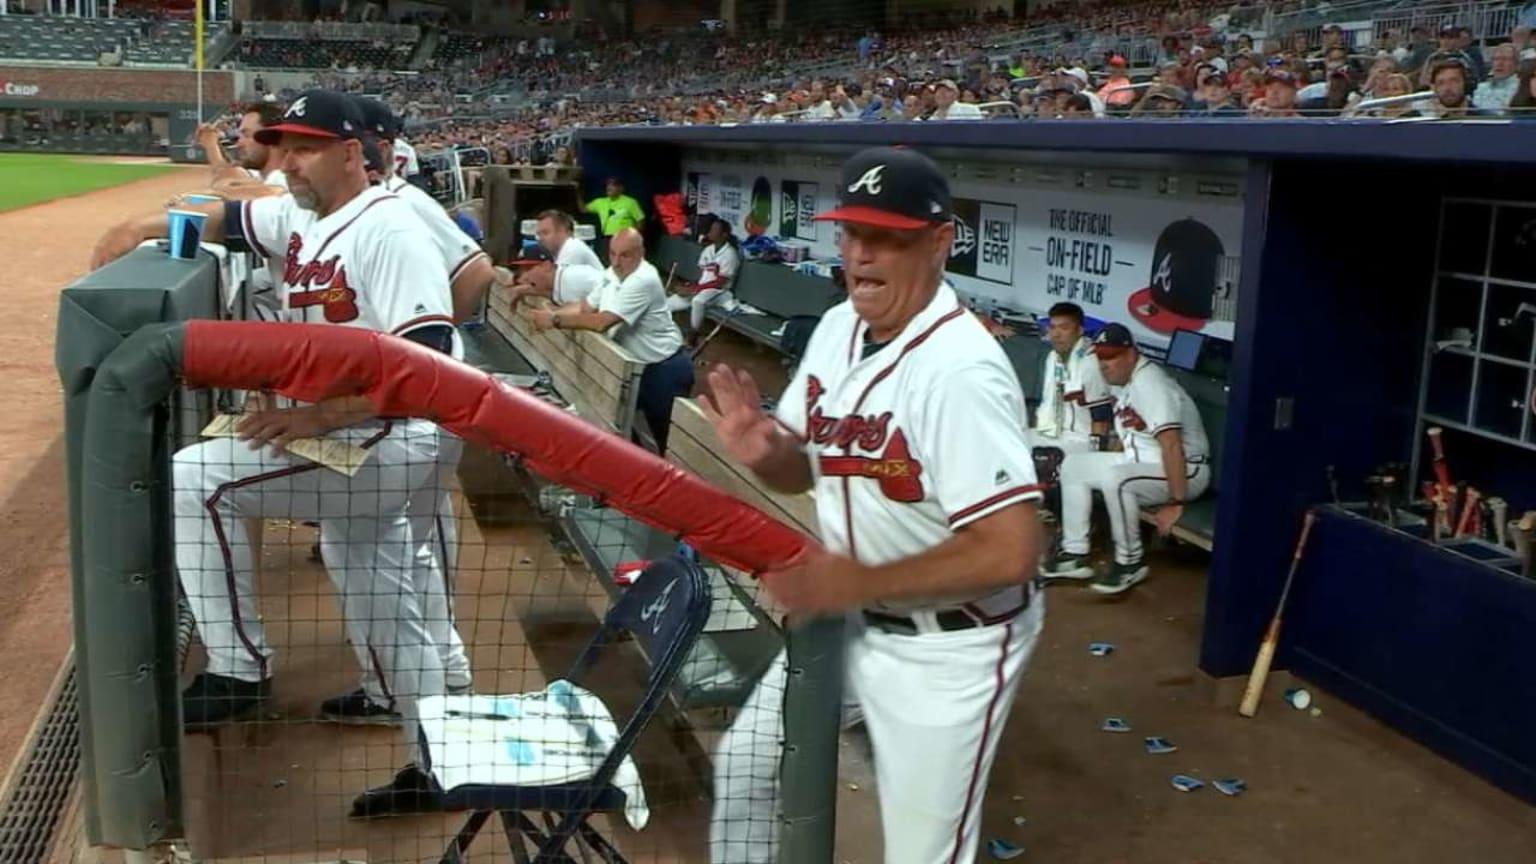 Snitker evades a foul ball   09/20/2018   MLB com